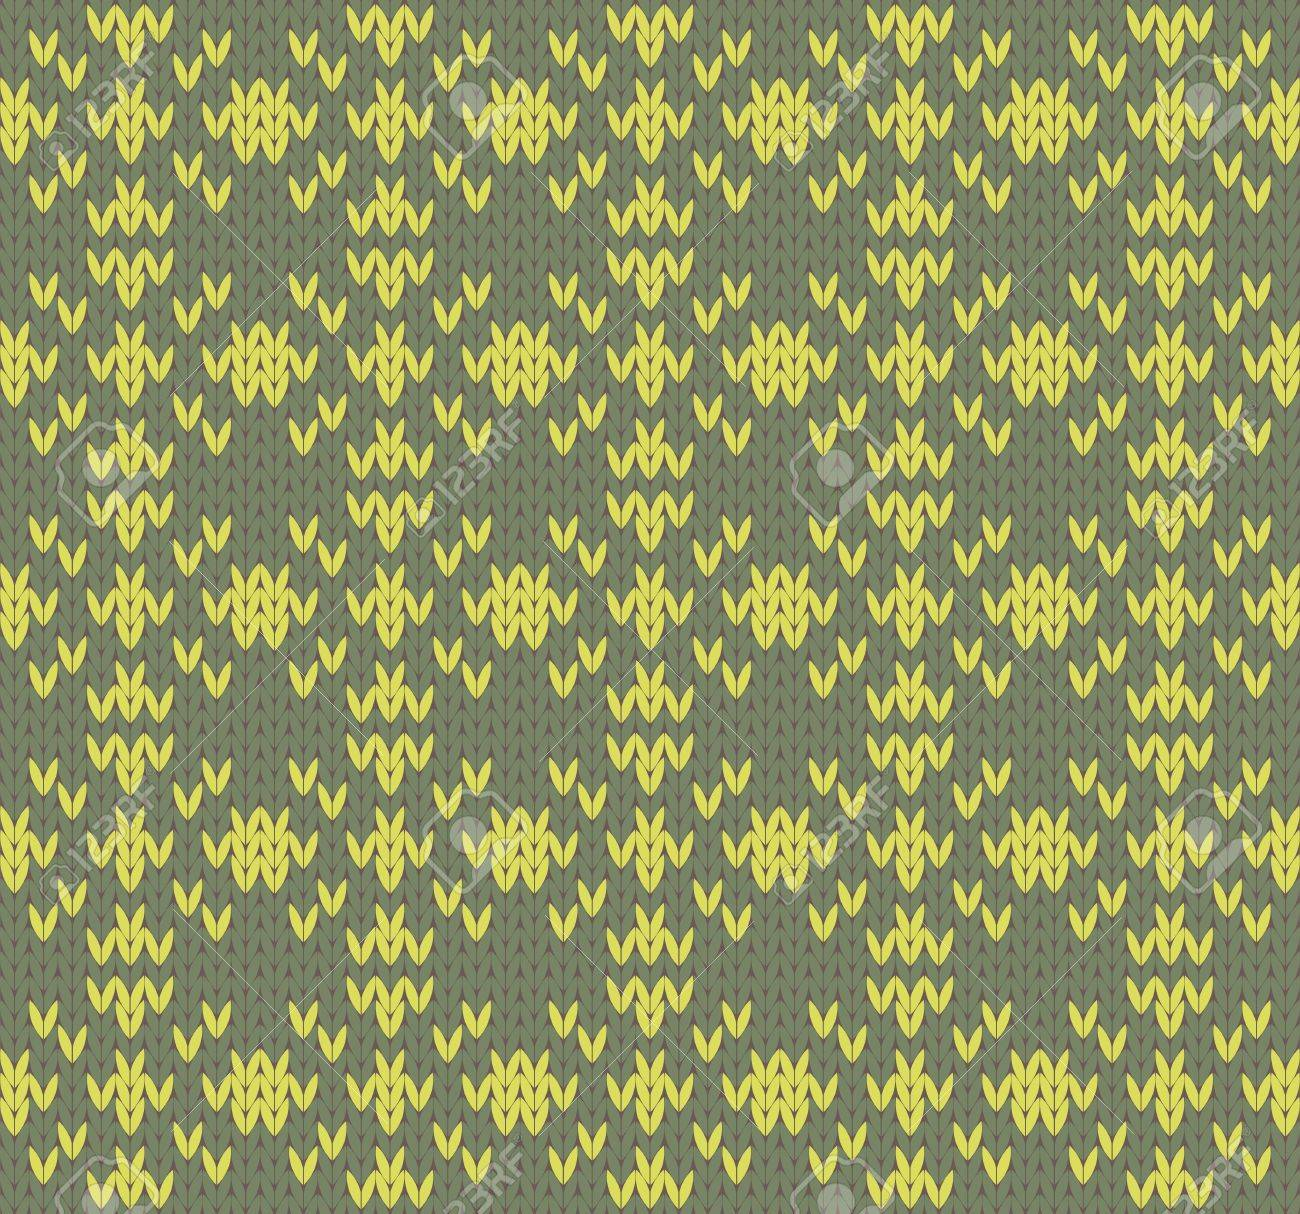 Seamless knit pattern imitation ethnic style Stock Vector - 17088419